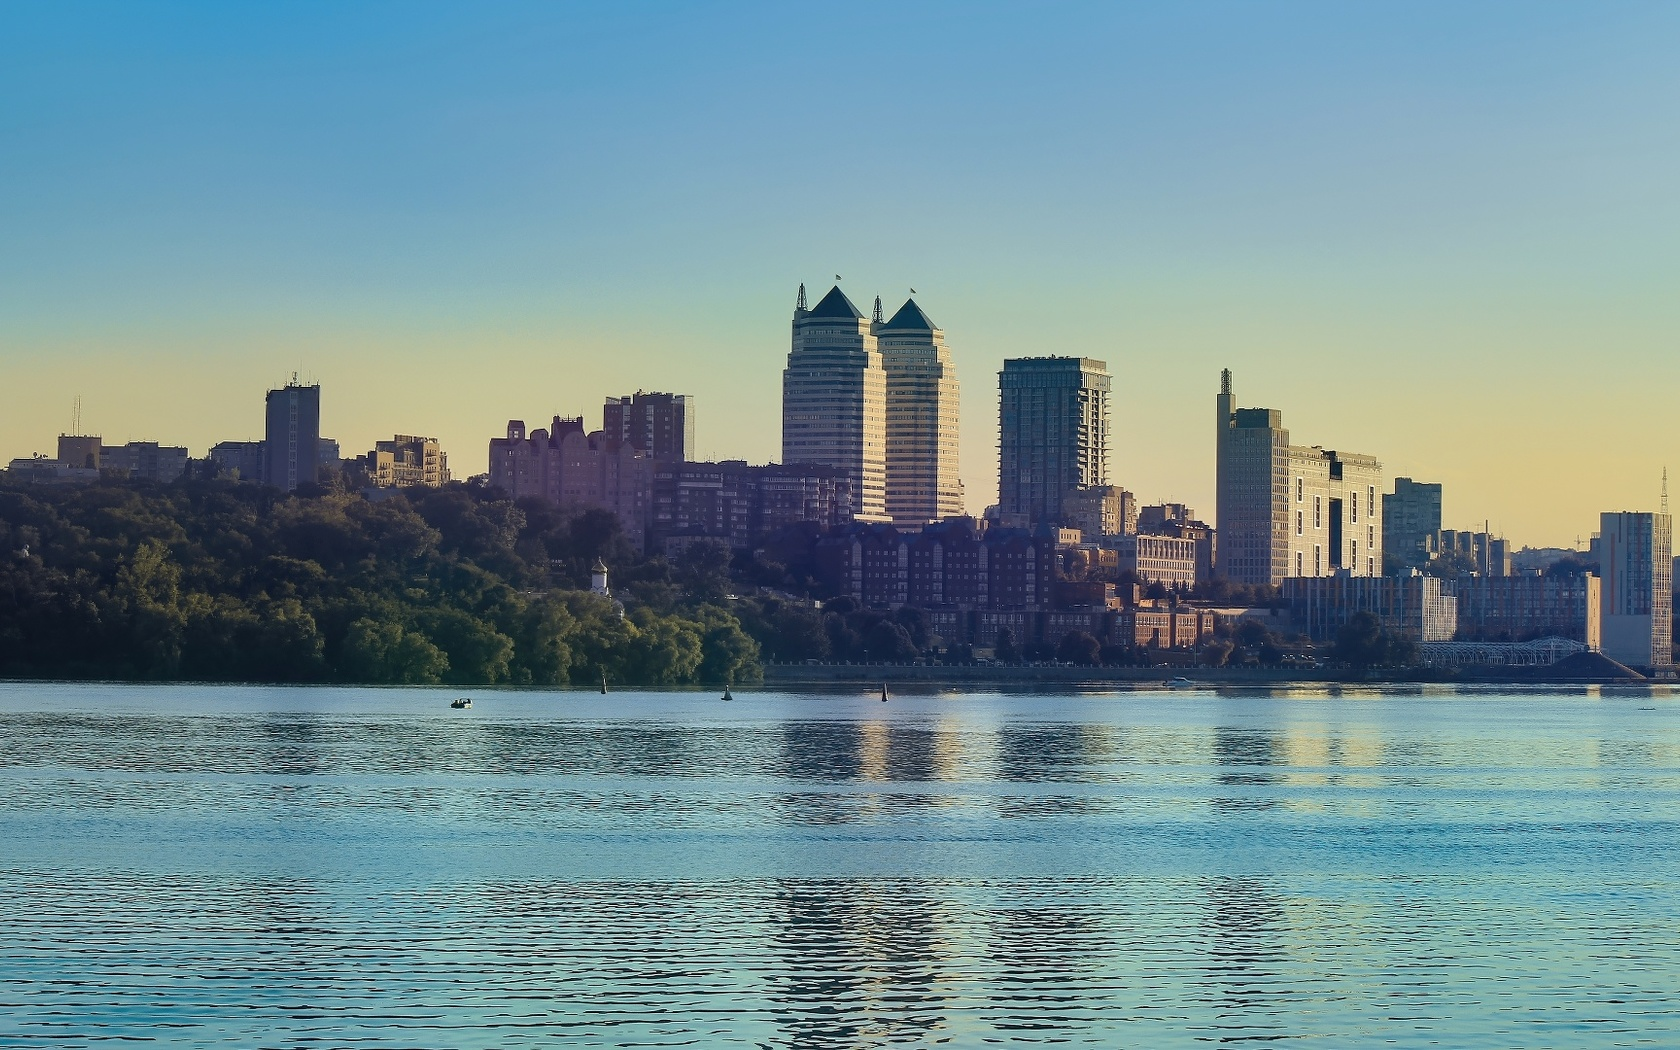 город, вода, река, дома